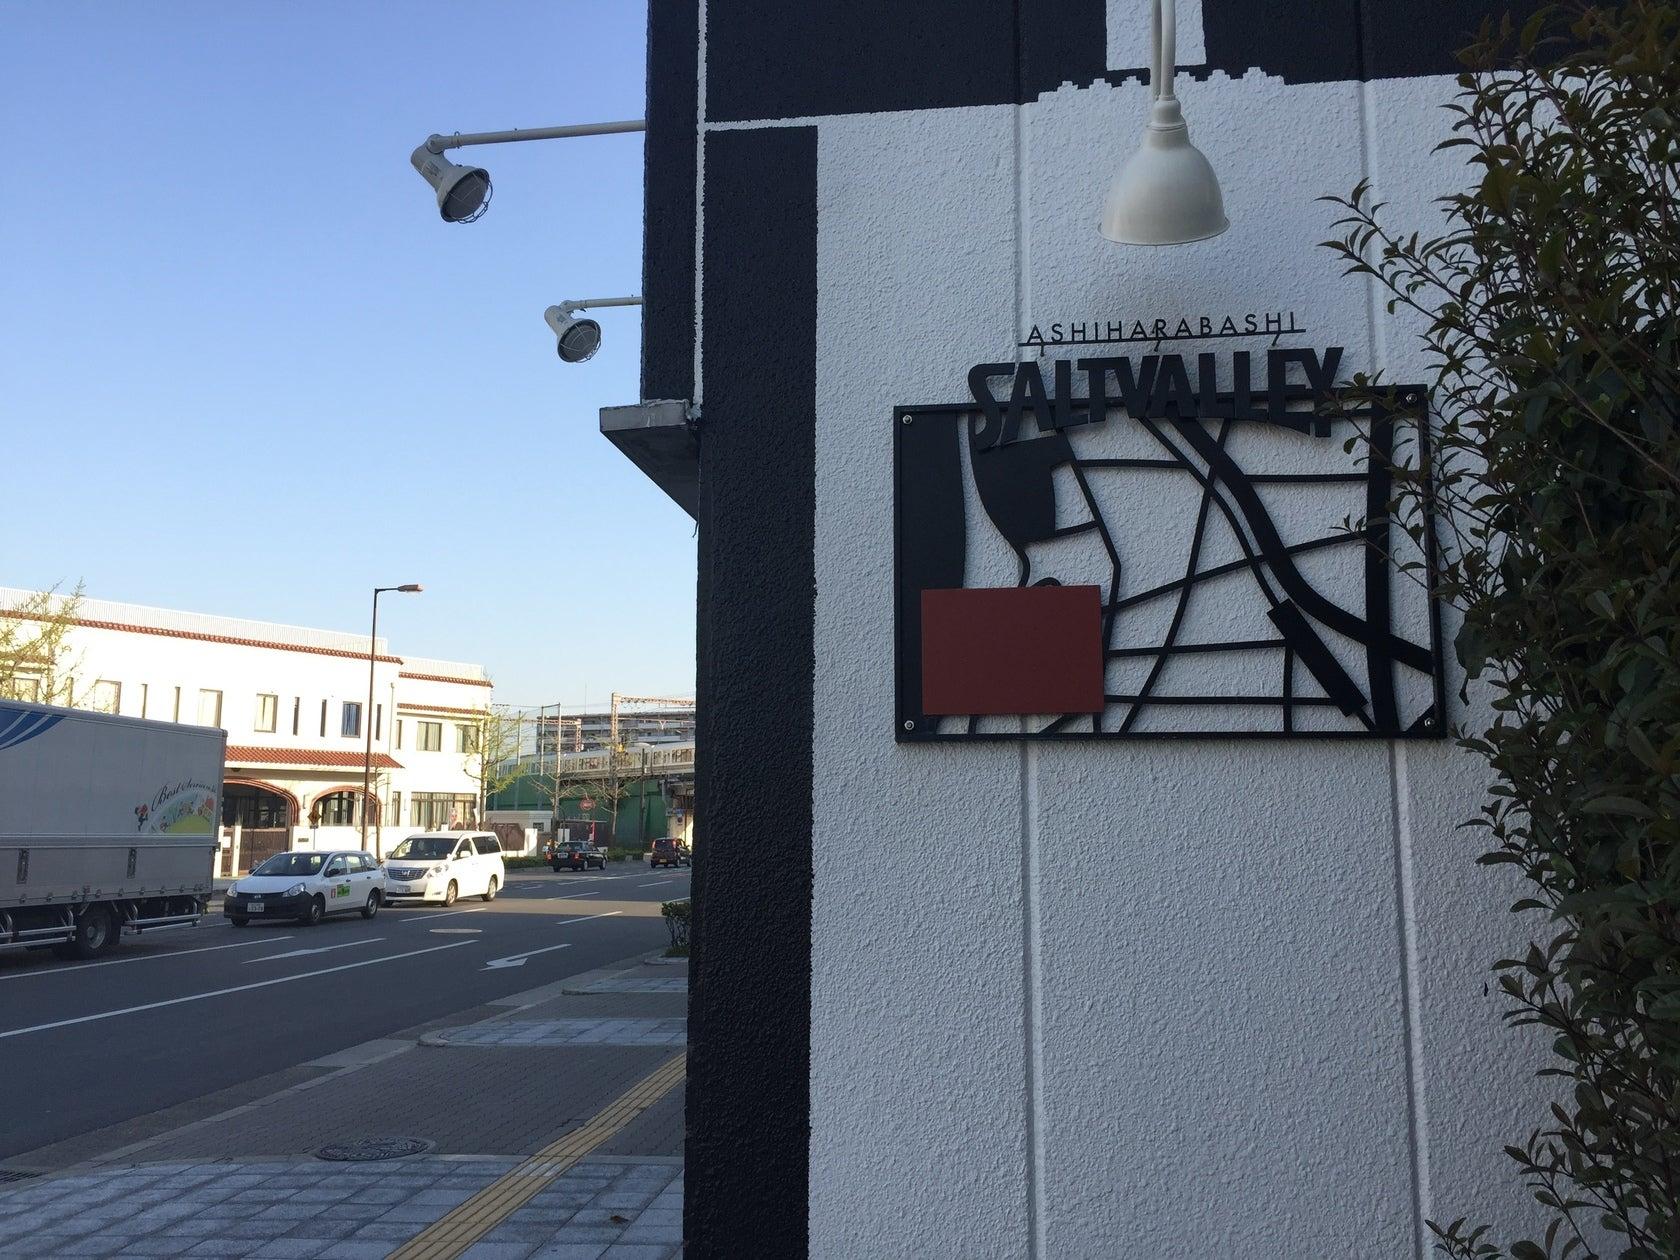 JR大阪環状線「芦原橋駅」2分まるまる貸切!ボタニカルガーデン利用可 の写真